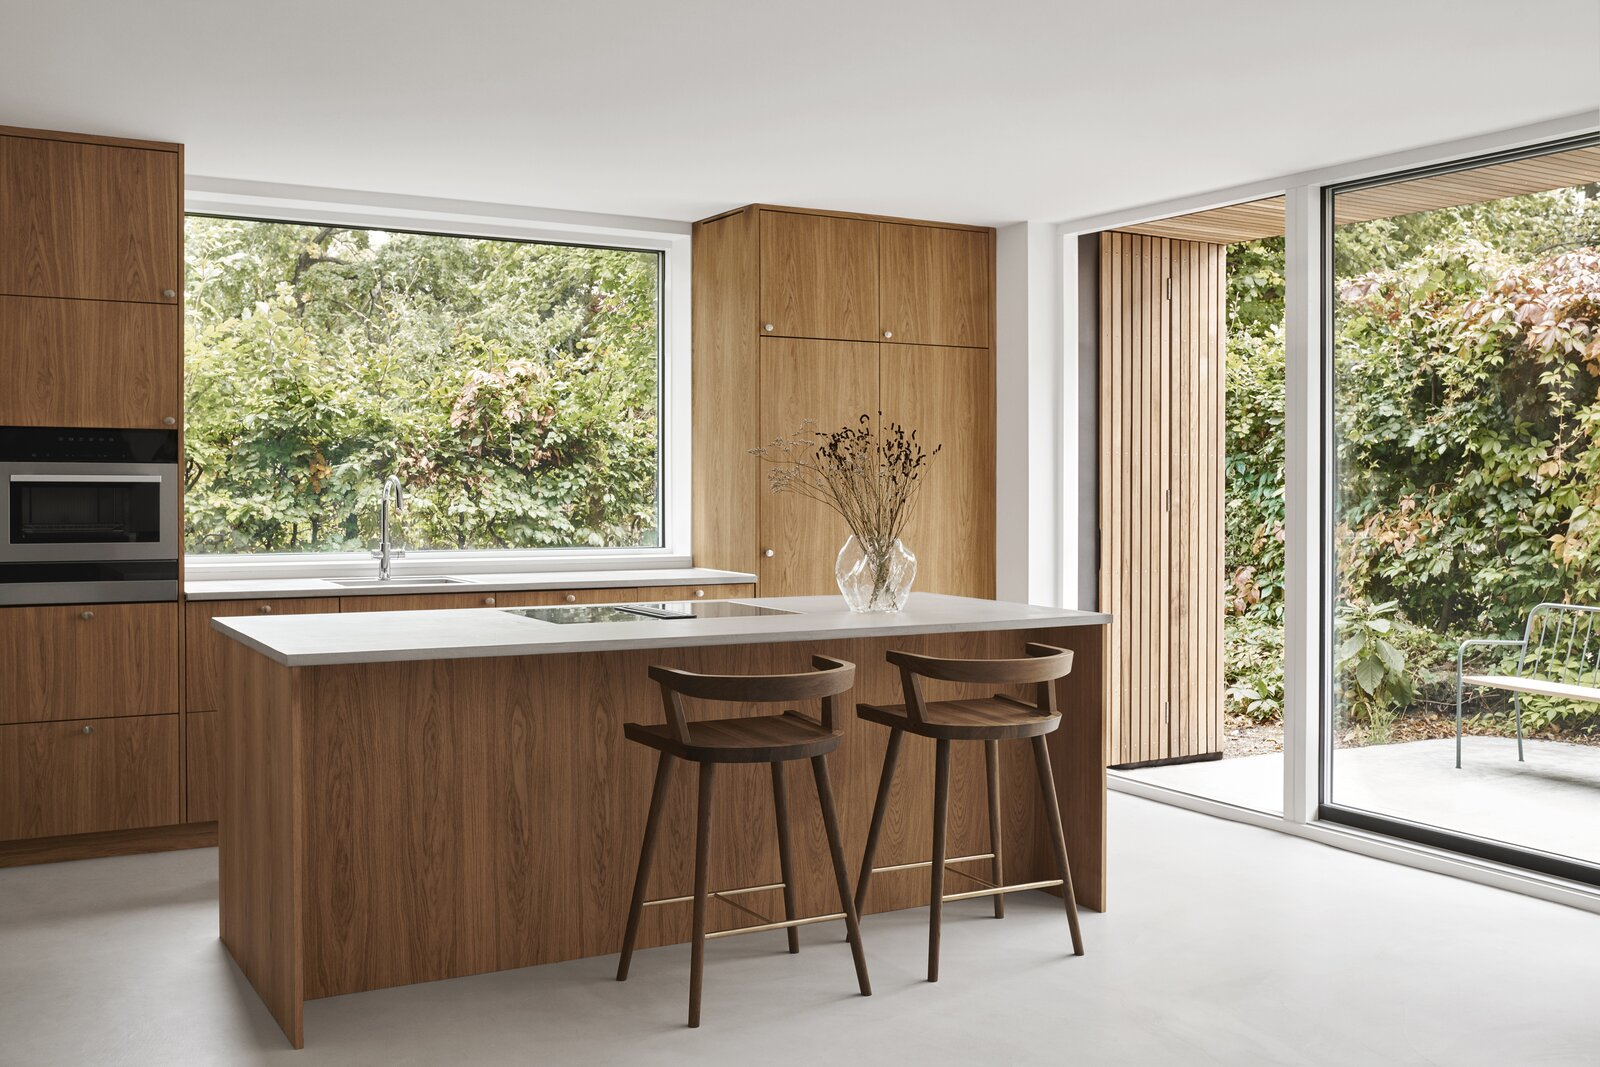 Villa Bülowsvej by EFFEKT kitchen with oak cabinets and concrete countertops